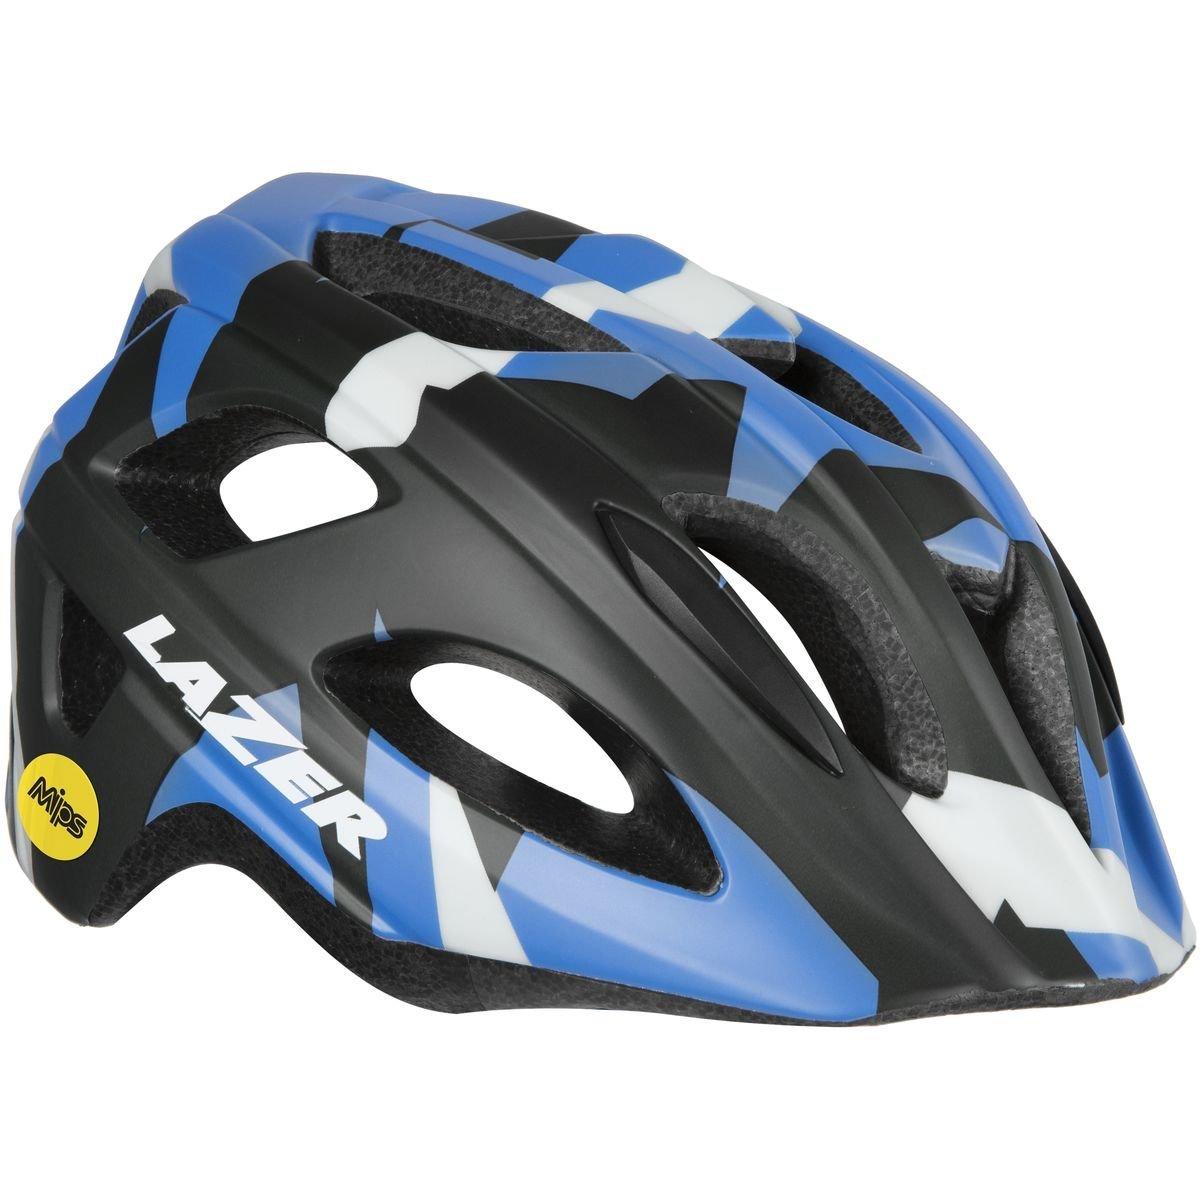 Kids Girls Bike Helmets Children Mountain Bike Helmet Men Road Cycling Helmet